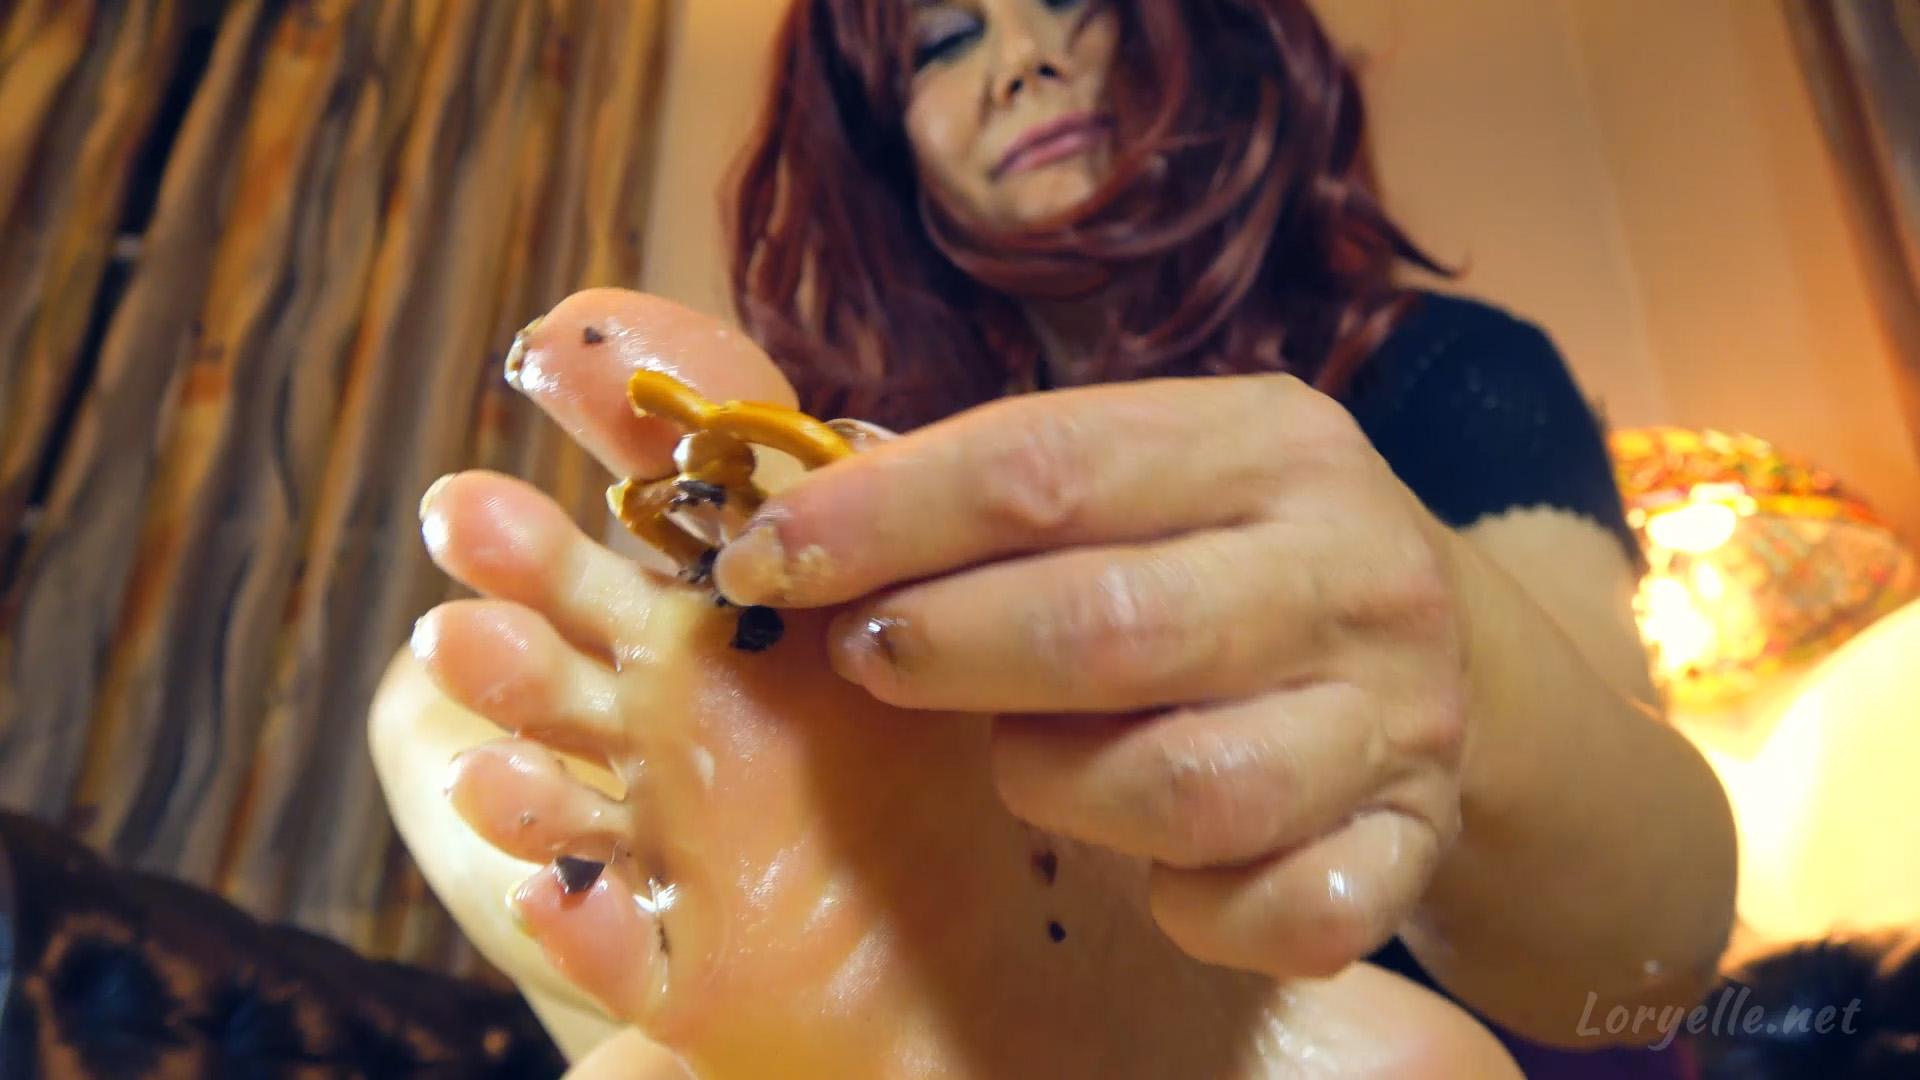 Loryelle Sweaty Sweet Salty Foot Fetish Wet Messy